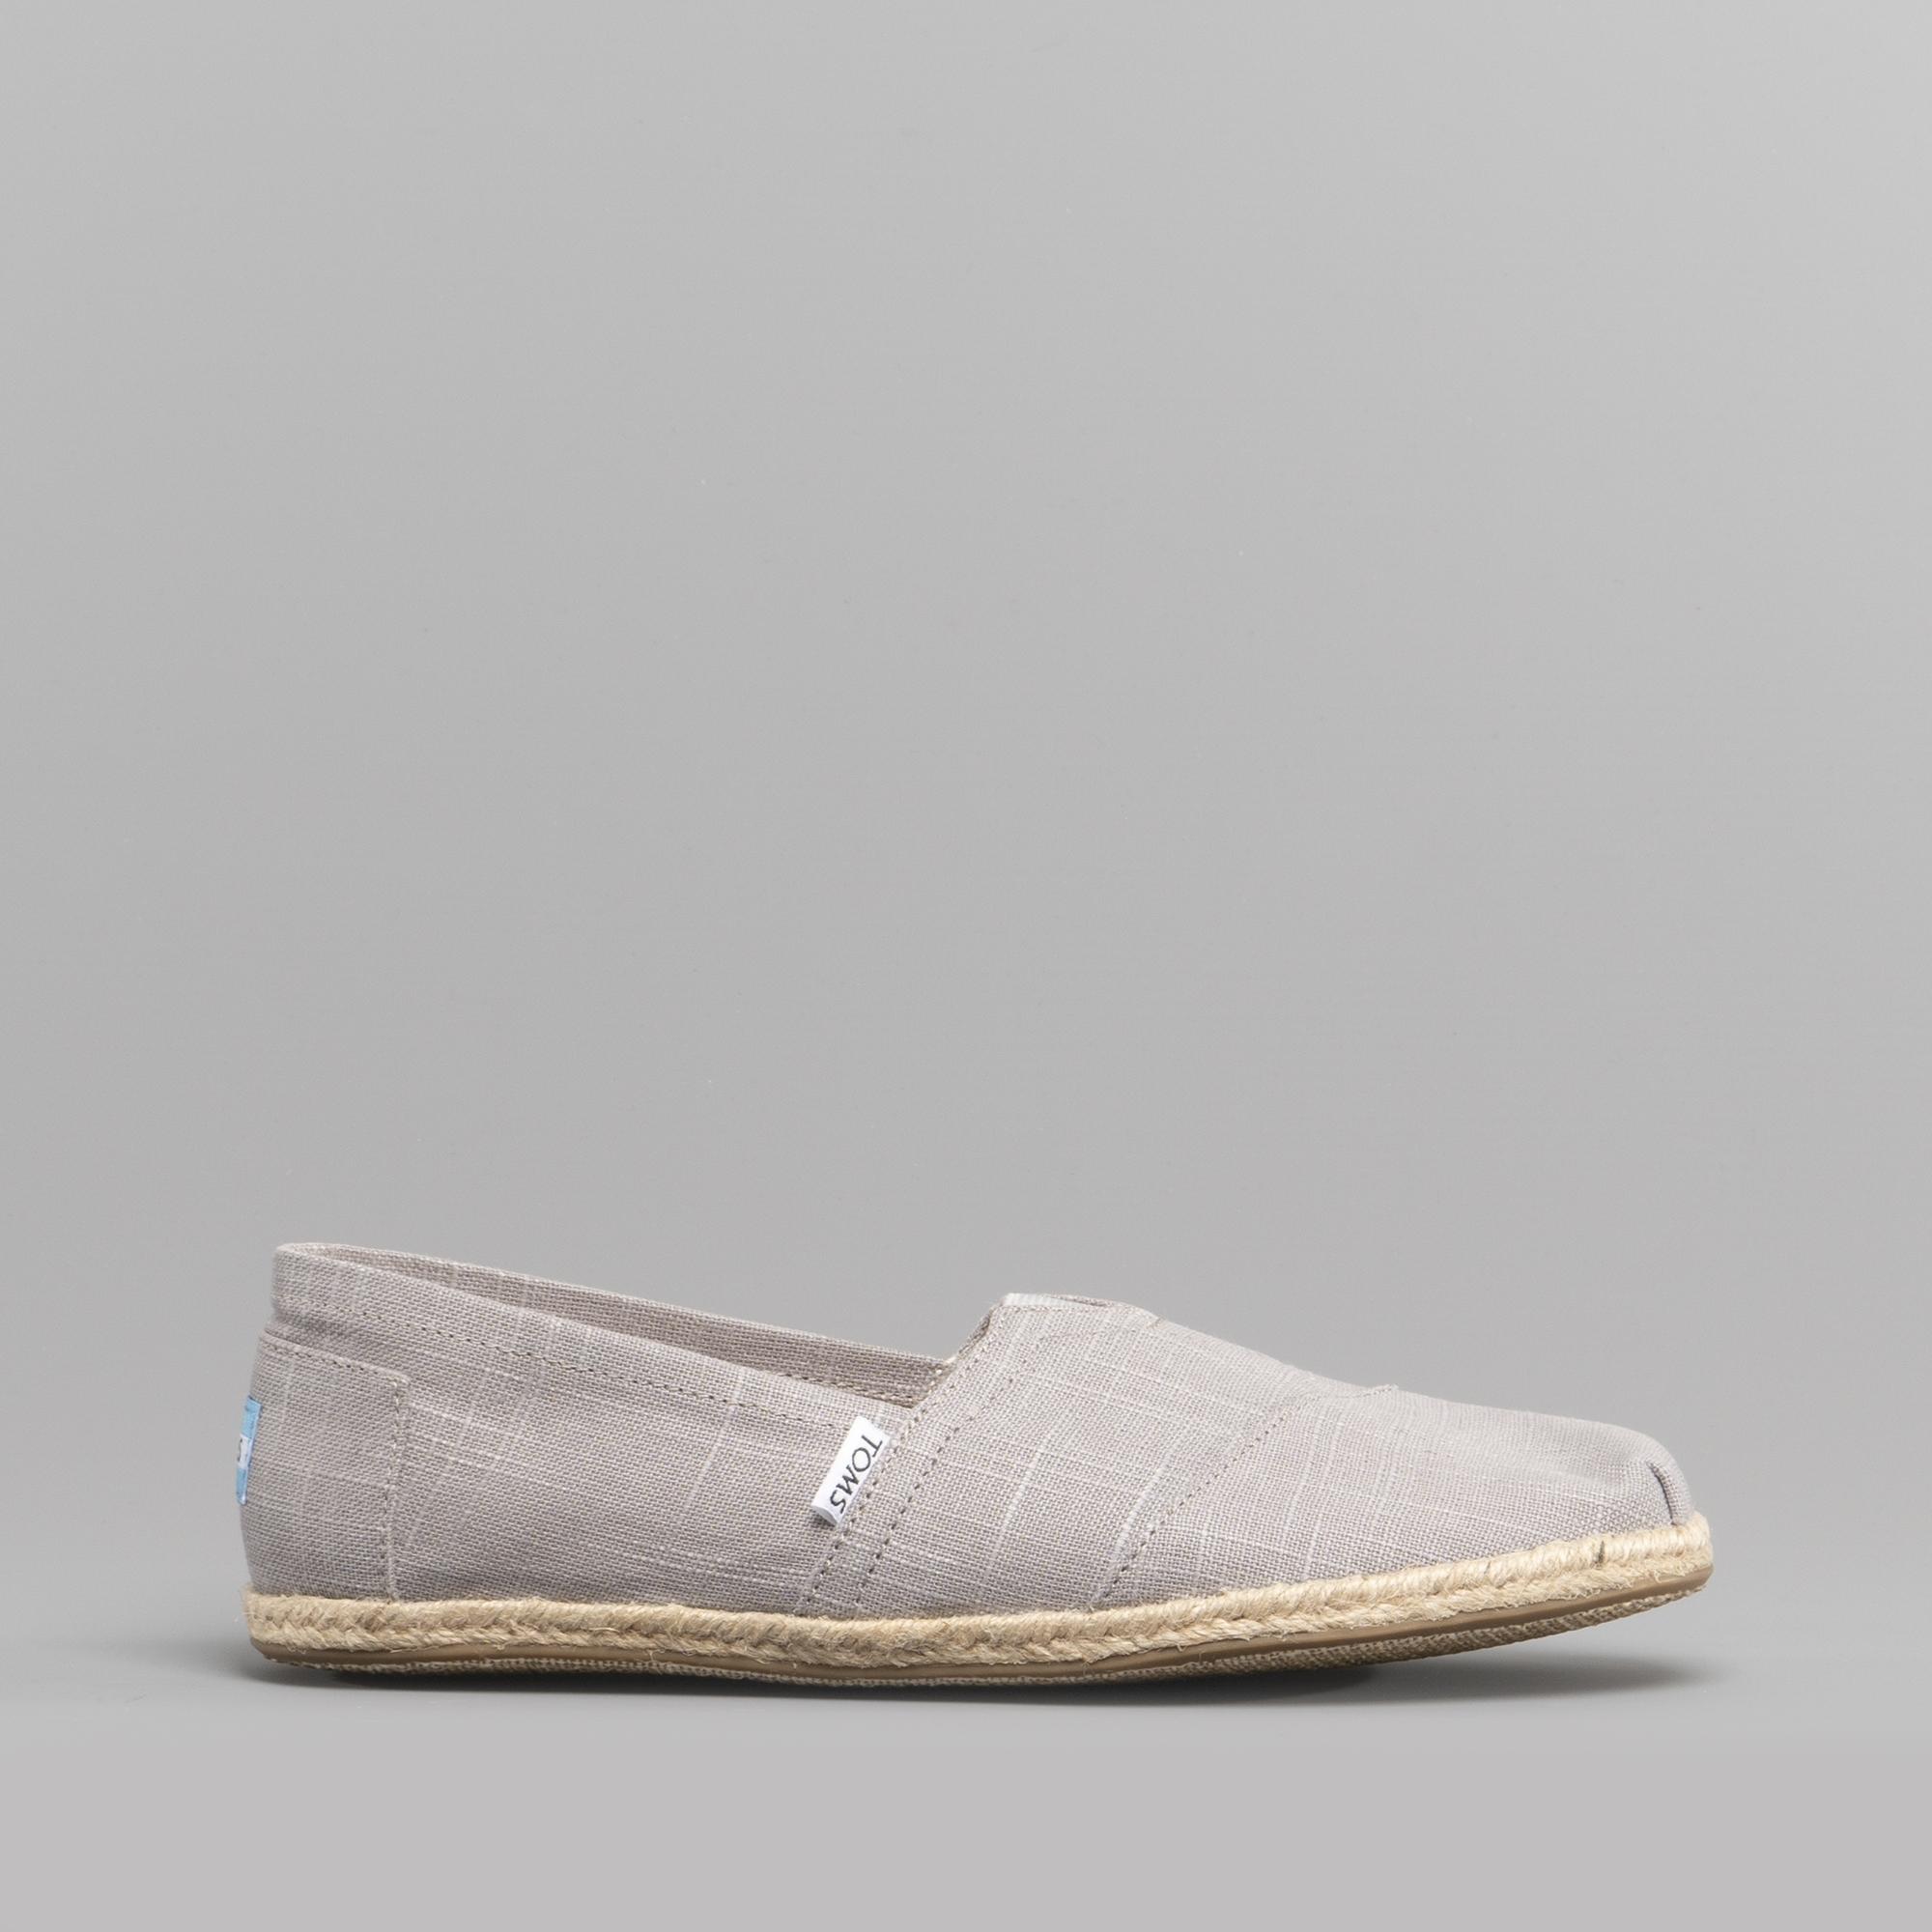 TOMS ALPARGATA 10008381 Mens Linen Slip On Shoes Grey